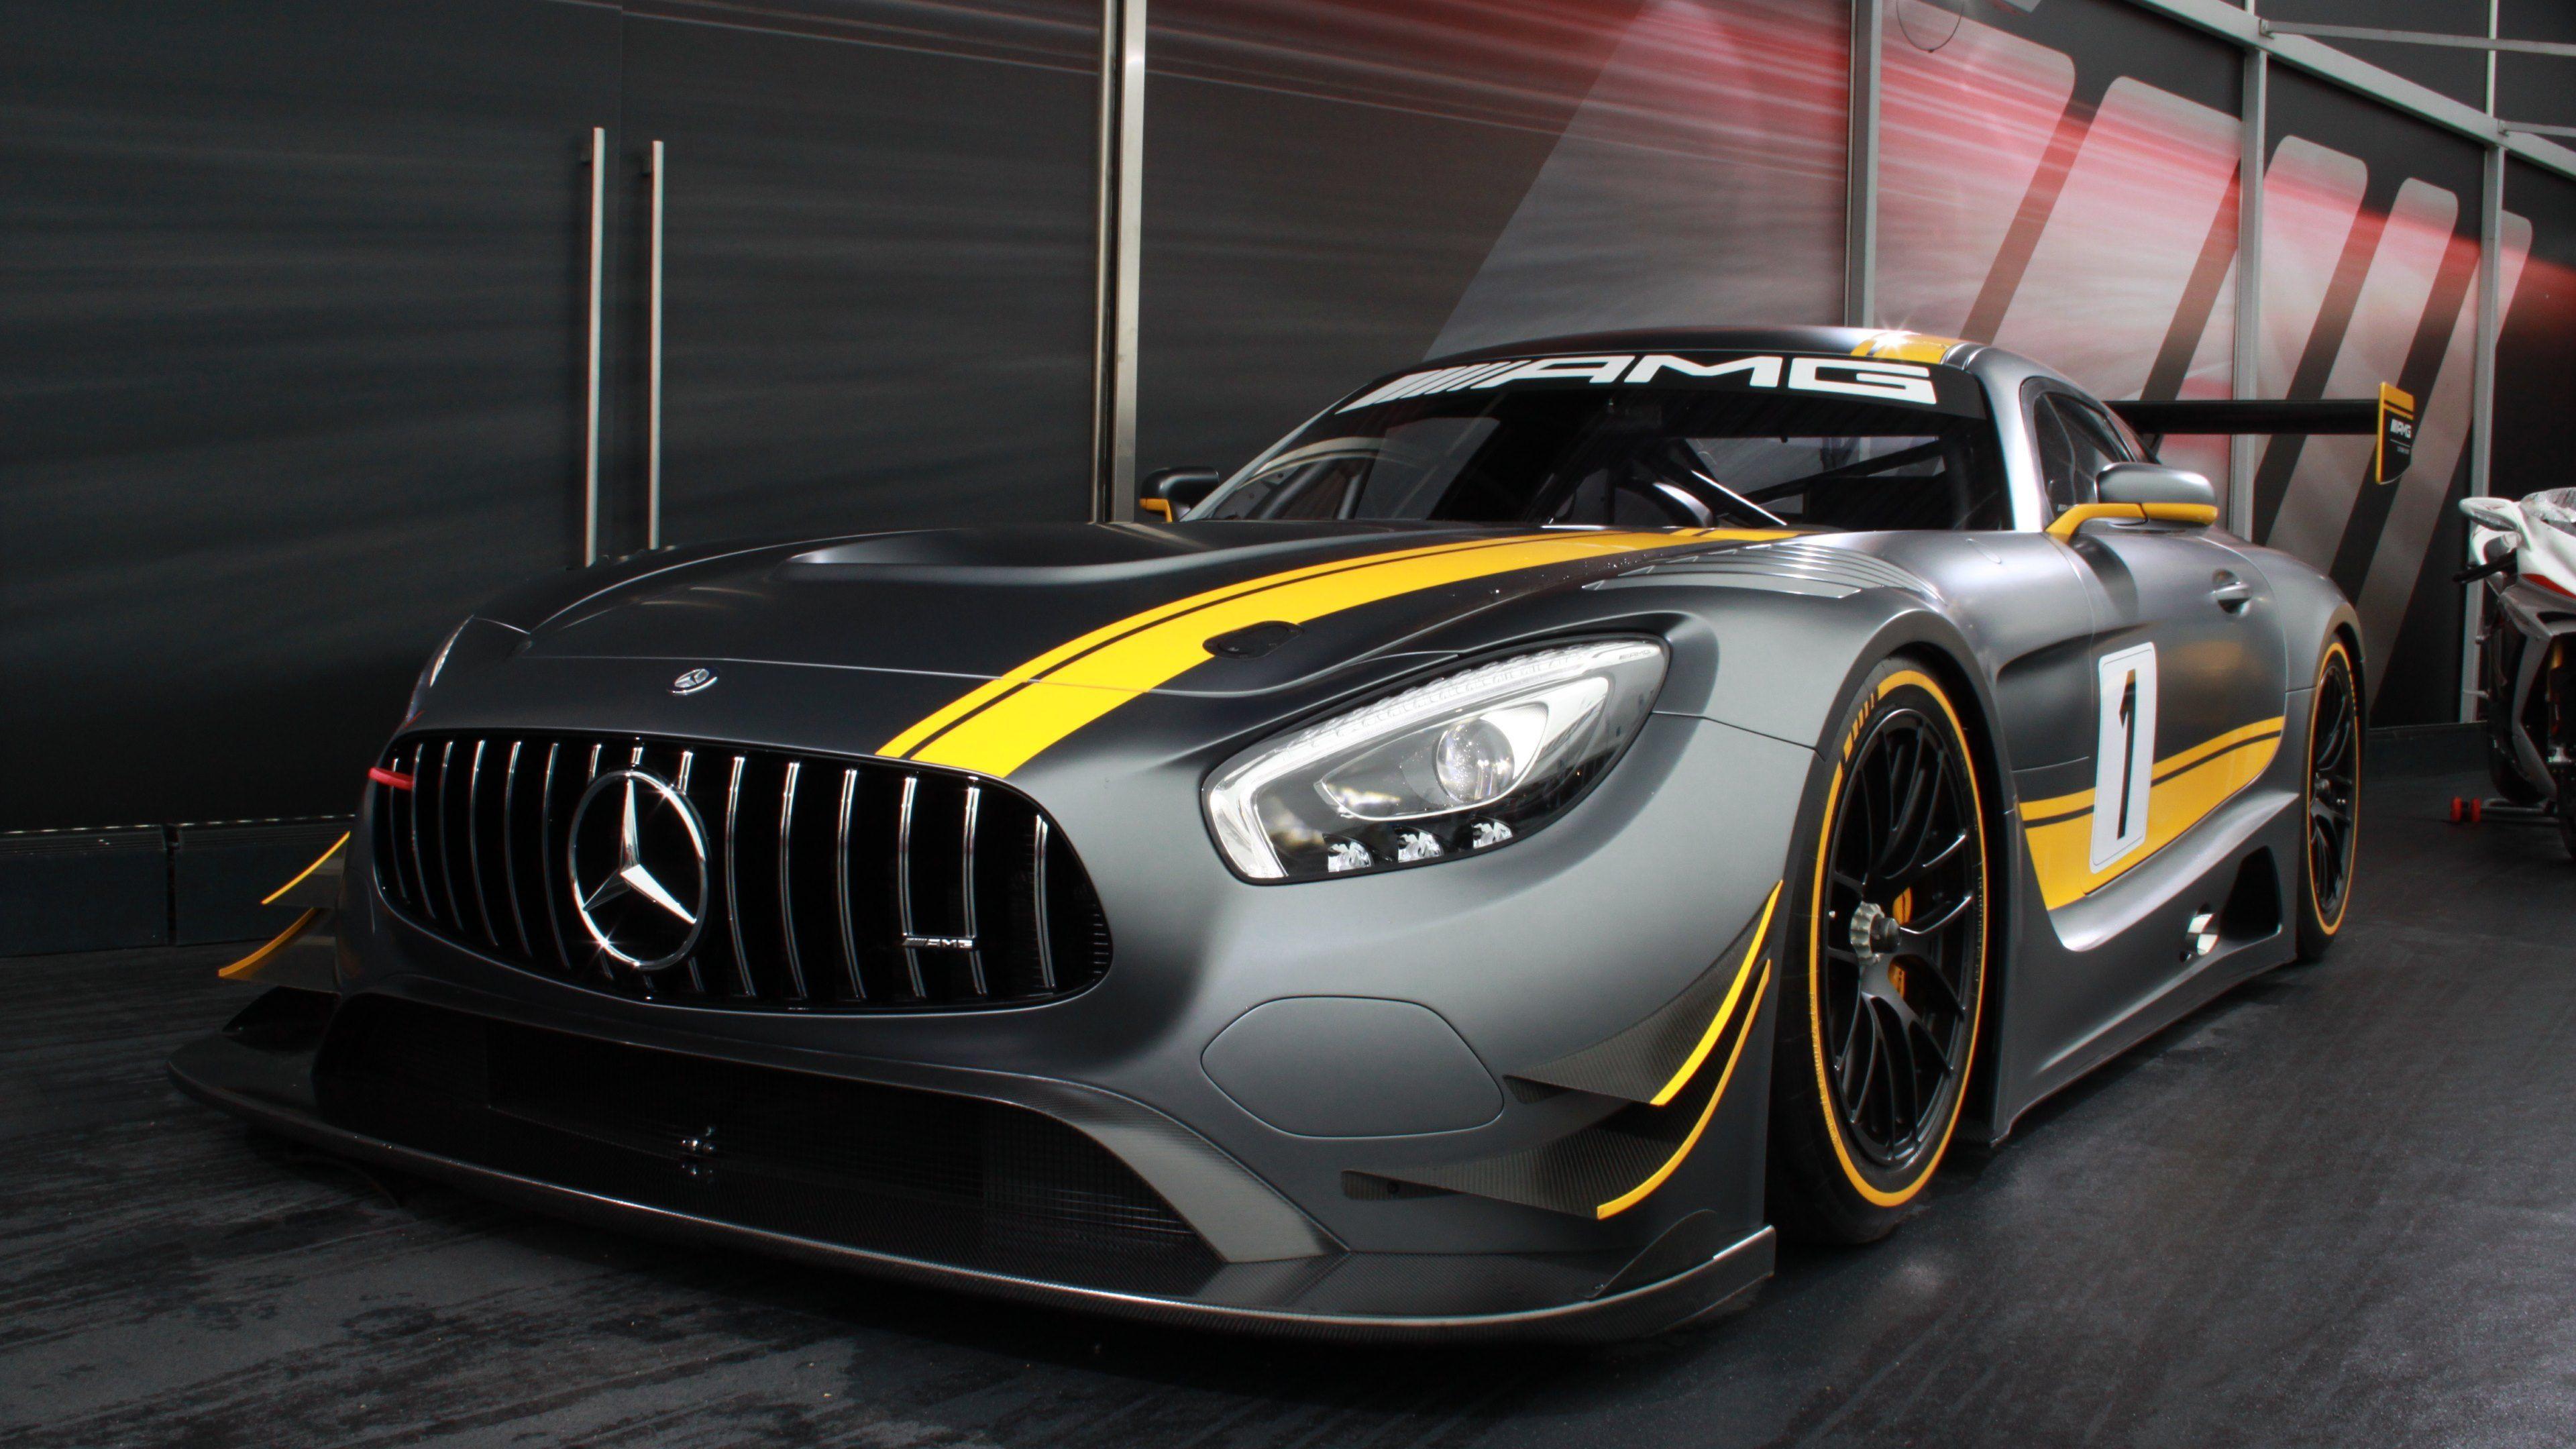 Mercedes AMG 4K Wallpapers - Top Free Mercedes AMG 4K ...